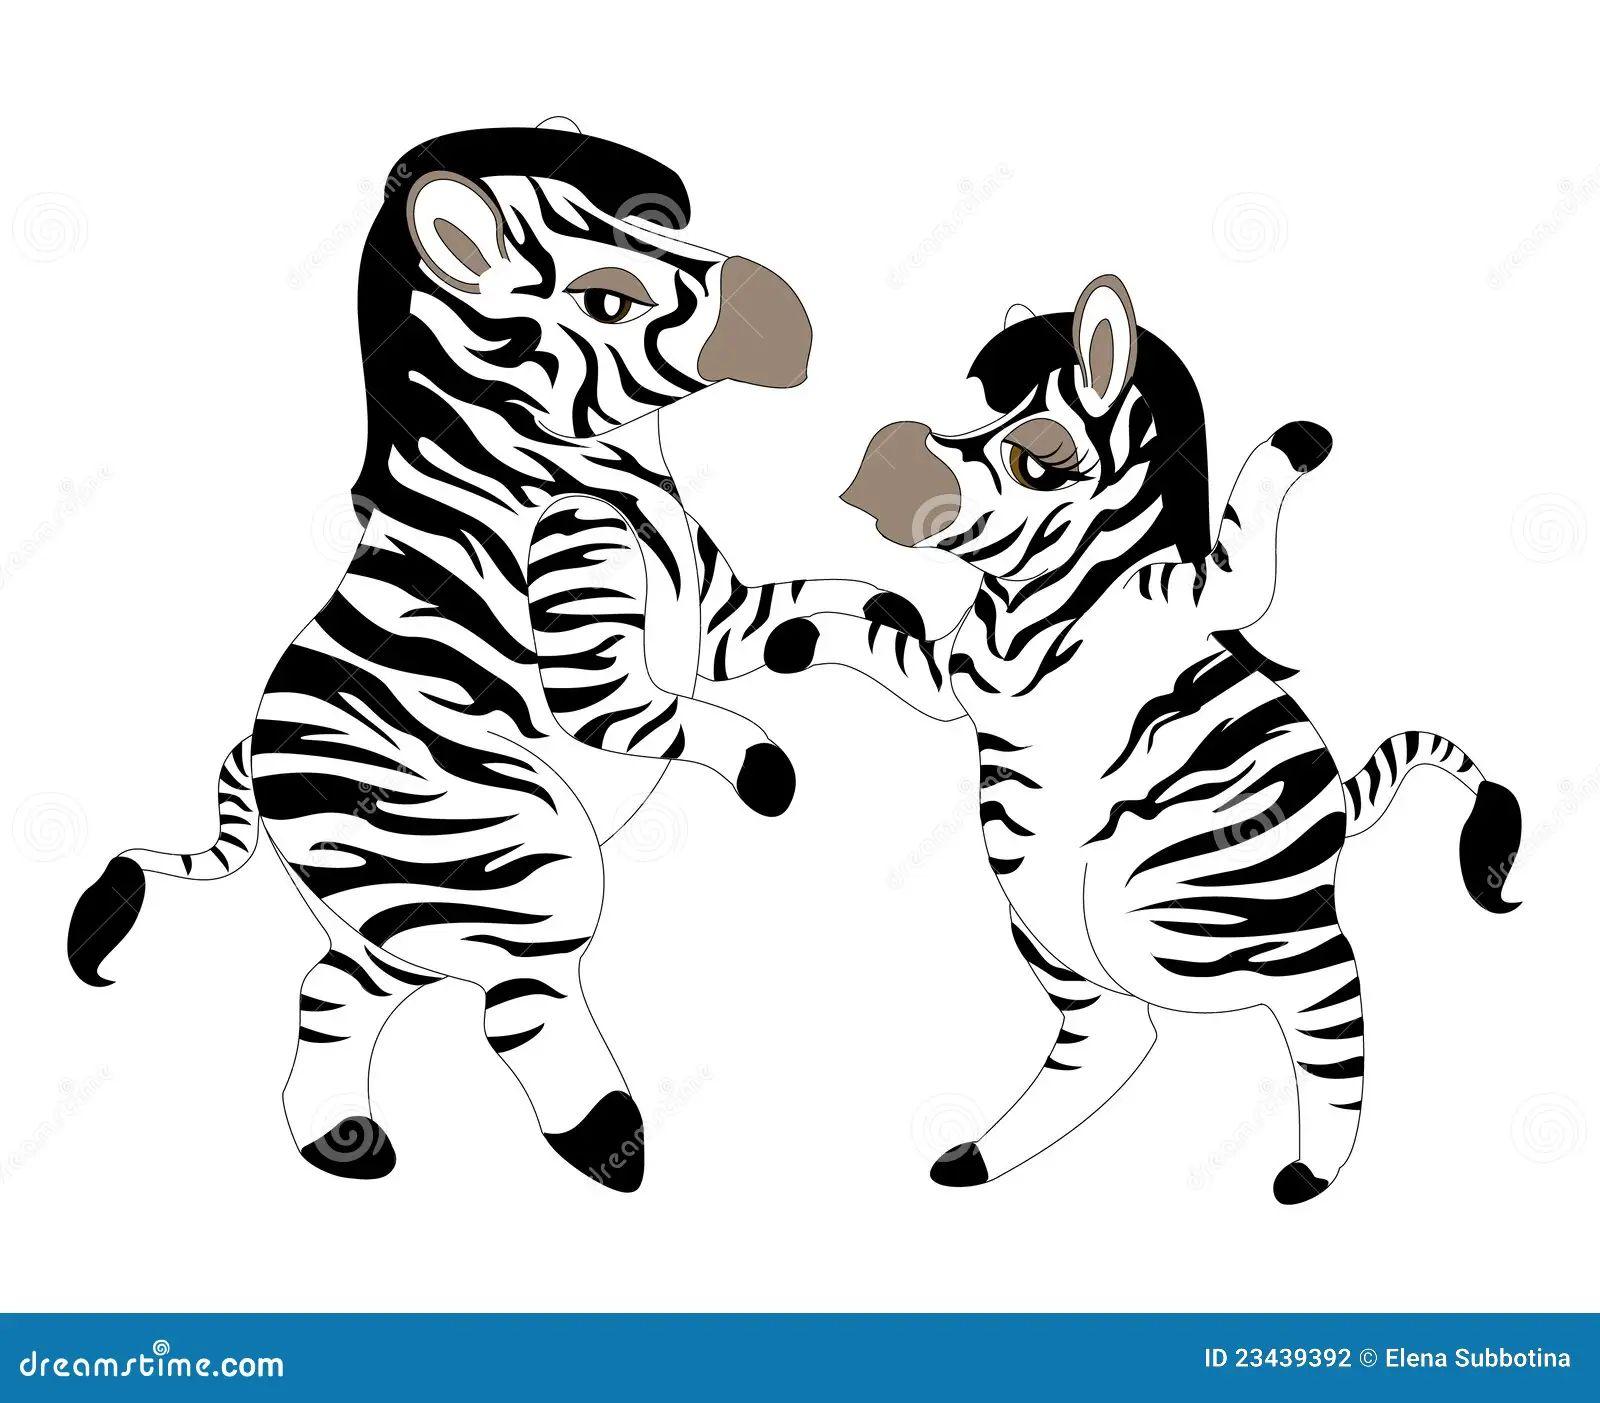 Zebra Animal Royalty Free Stock Photography Auto Electrical Wiring Epc Novyc Leds Diagram Dancing Zebras